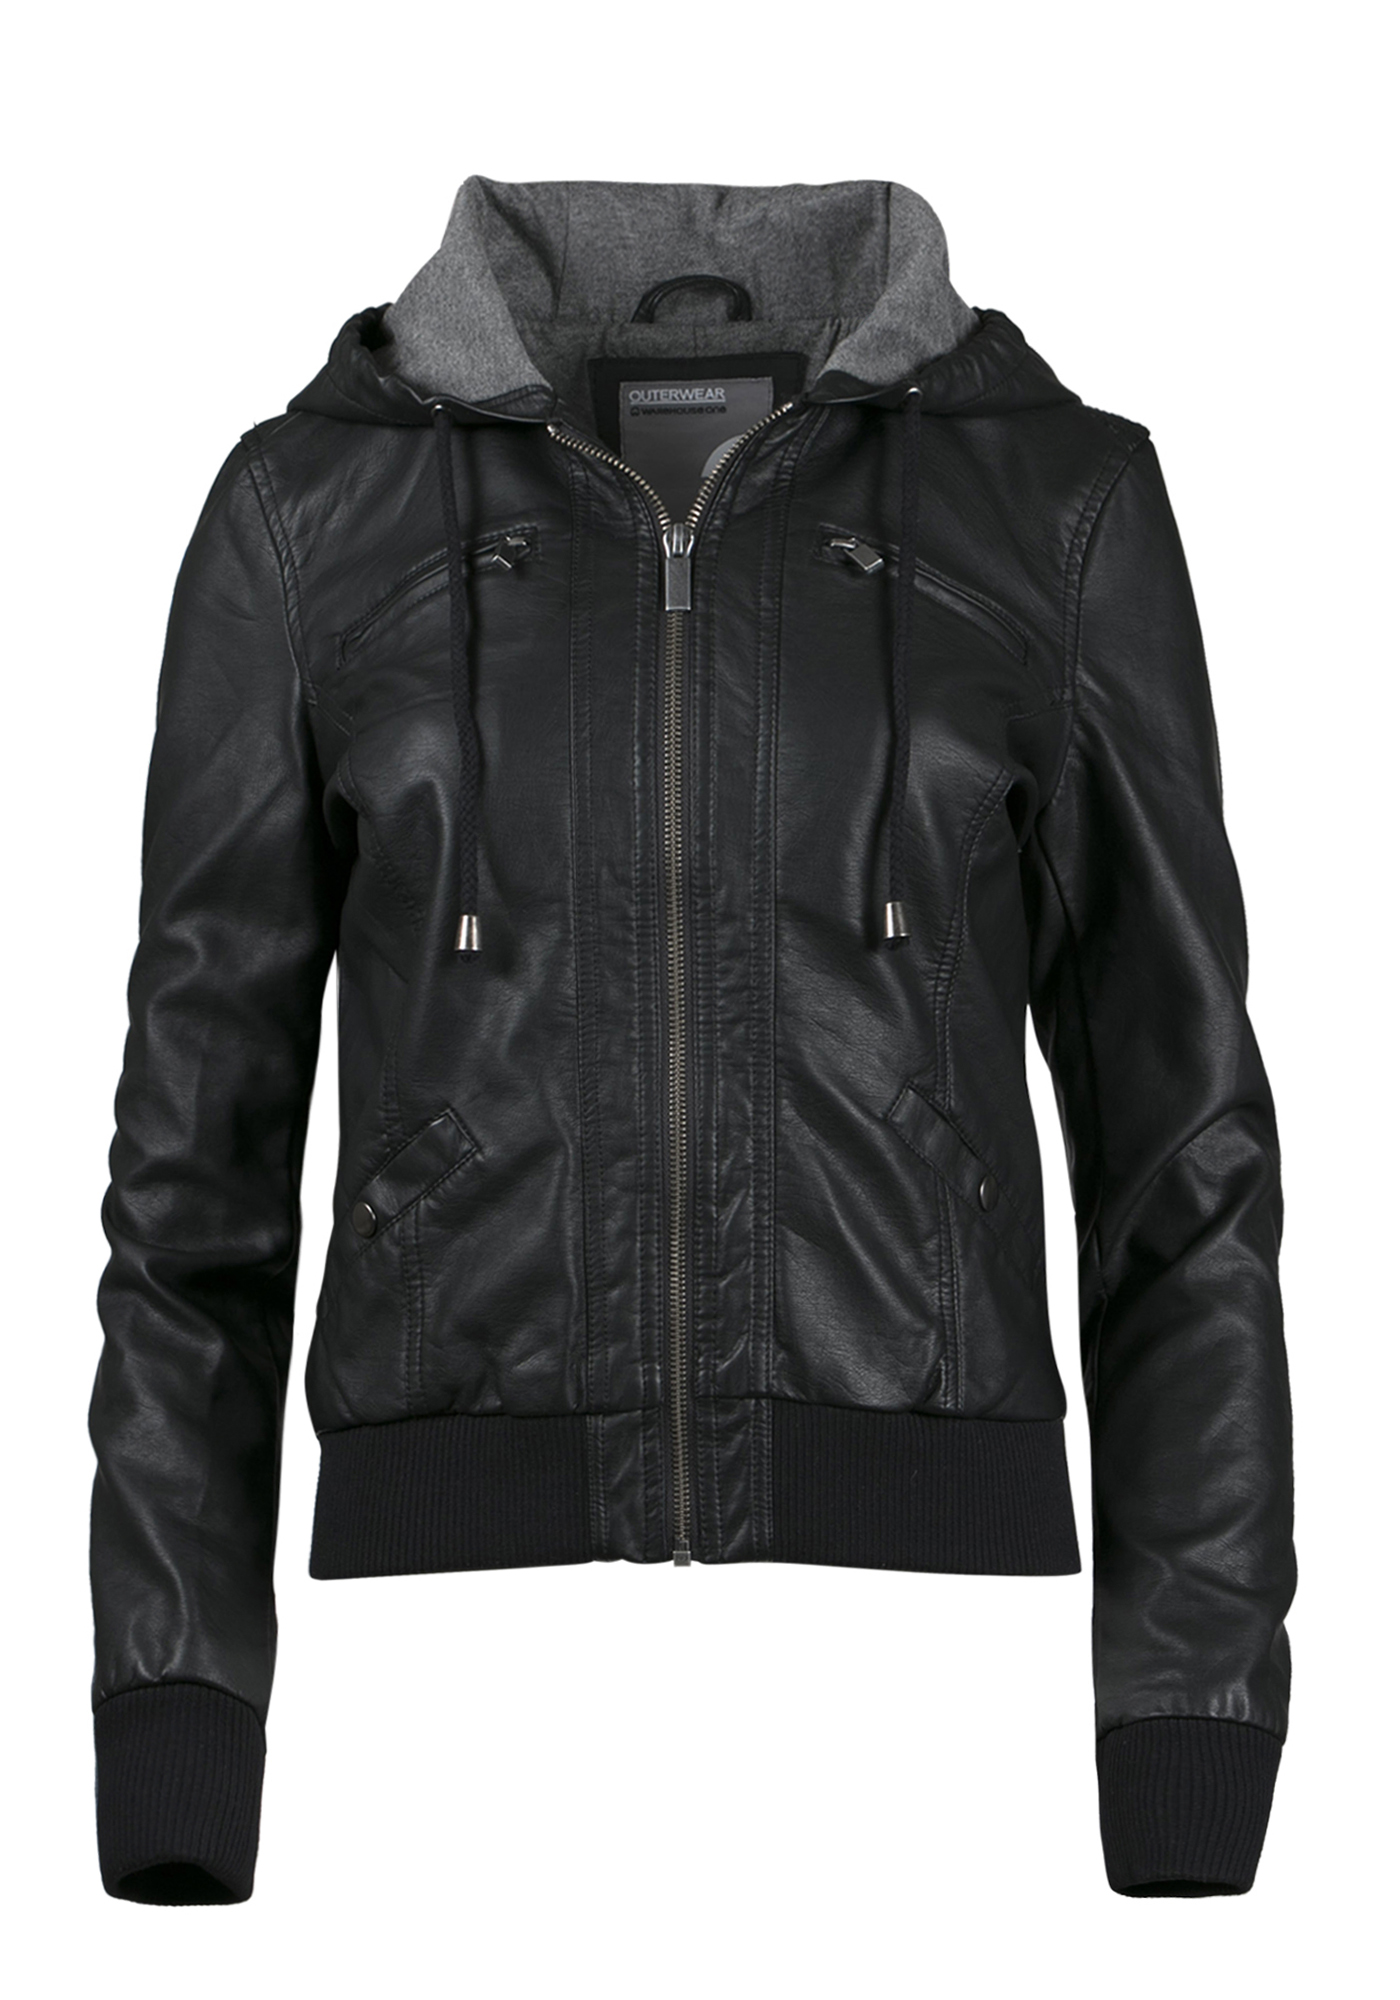 cb1891c6982 Ladies  Hooded Bomber Jacket